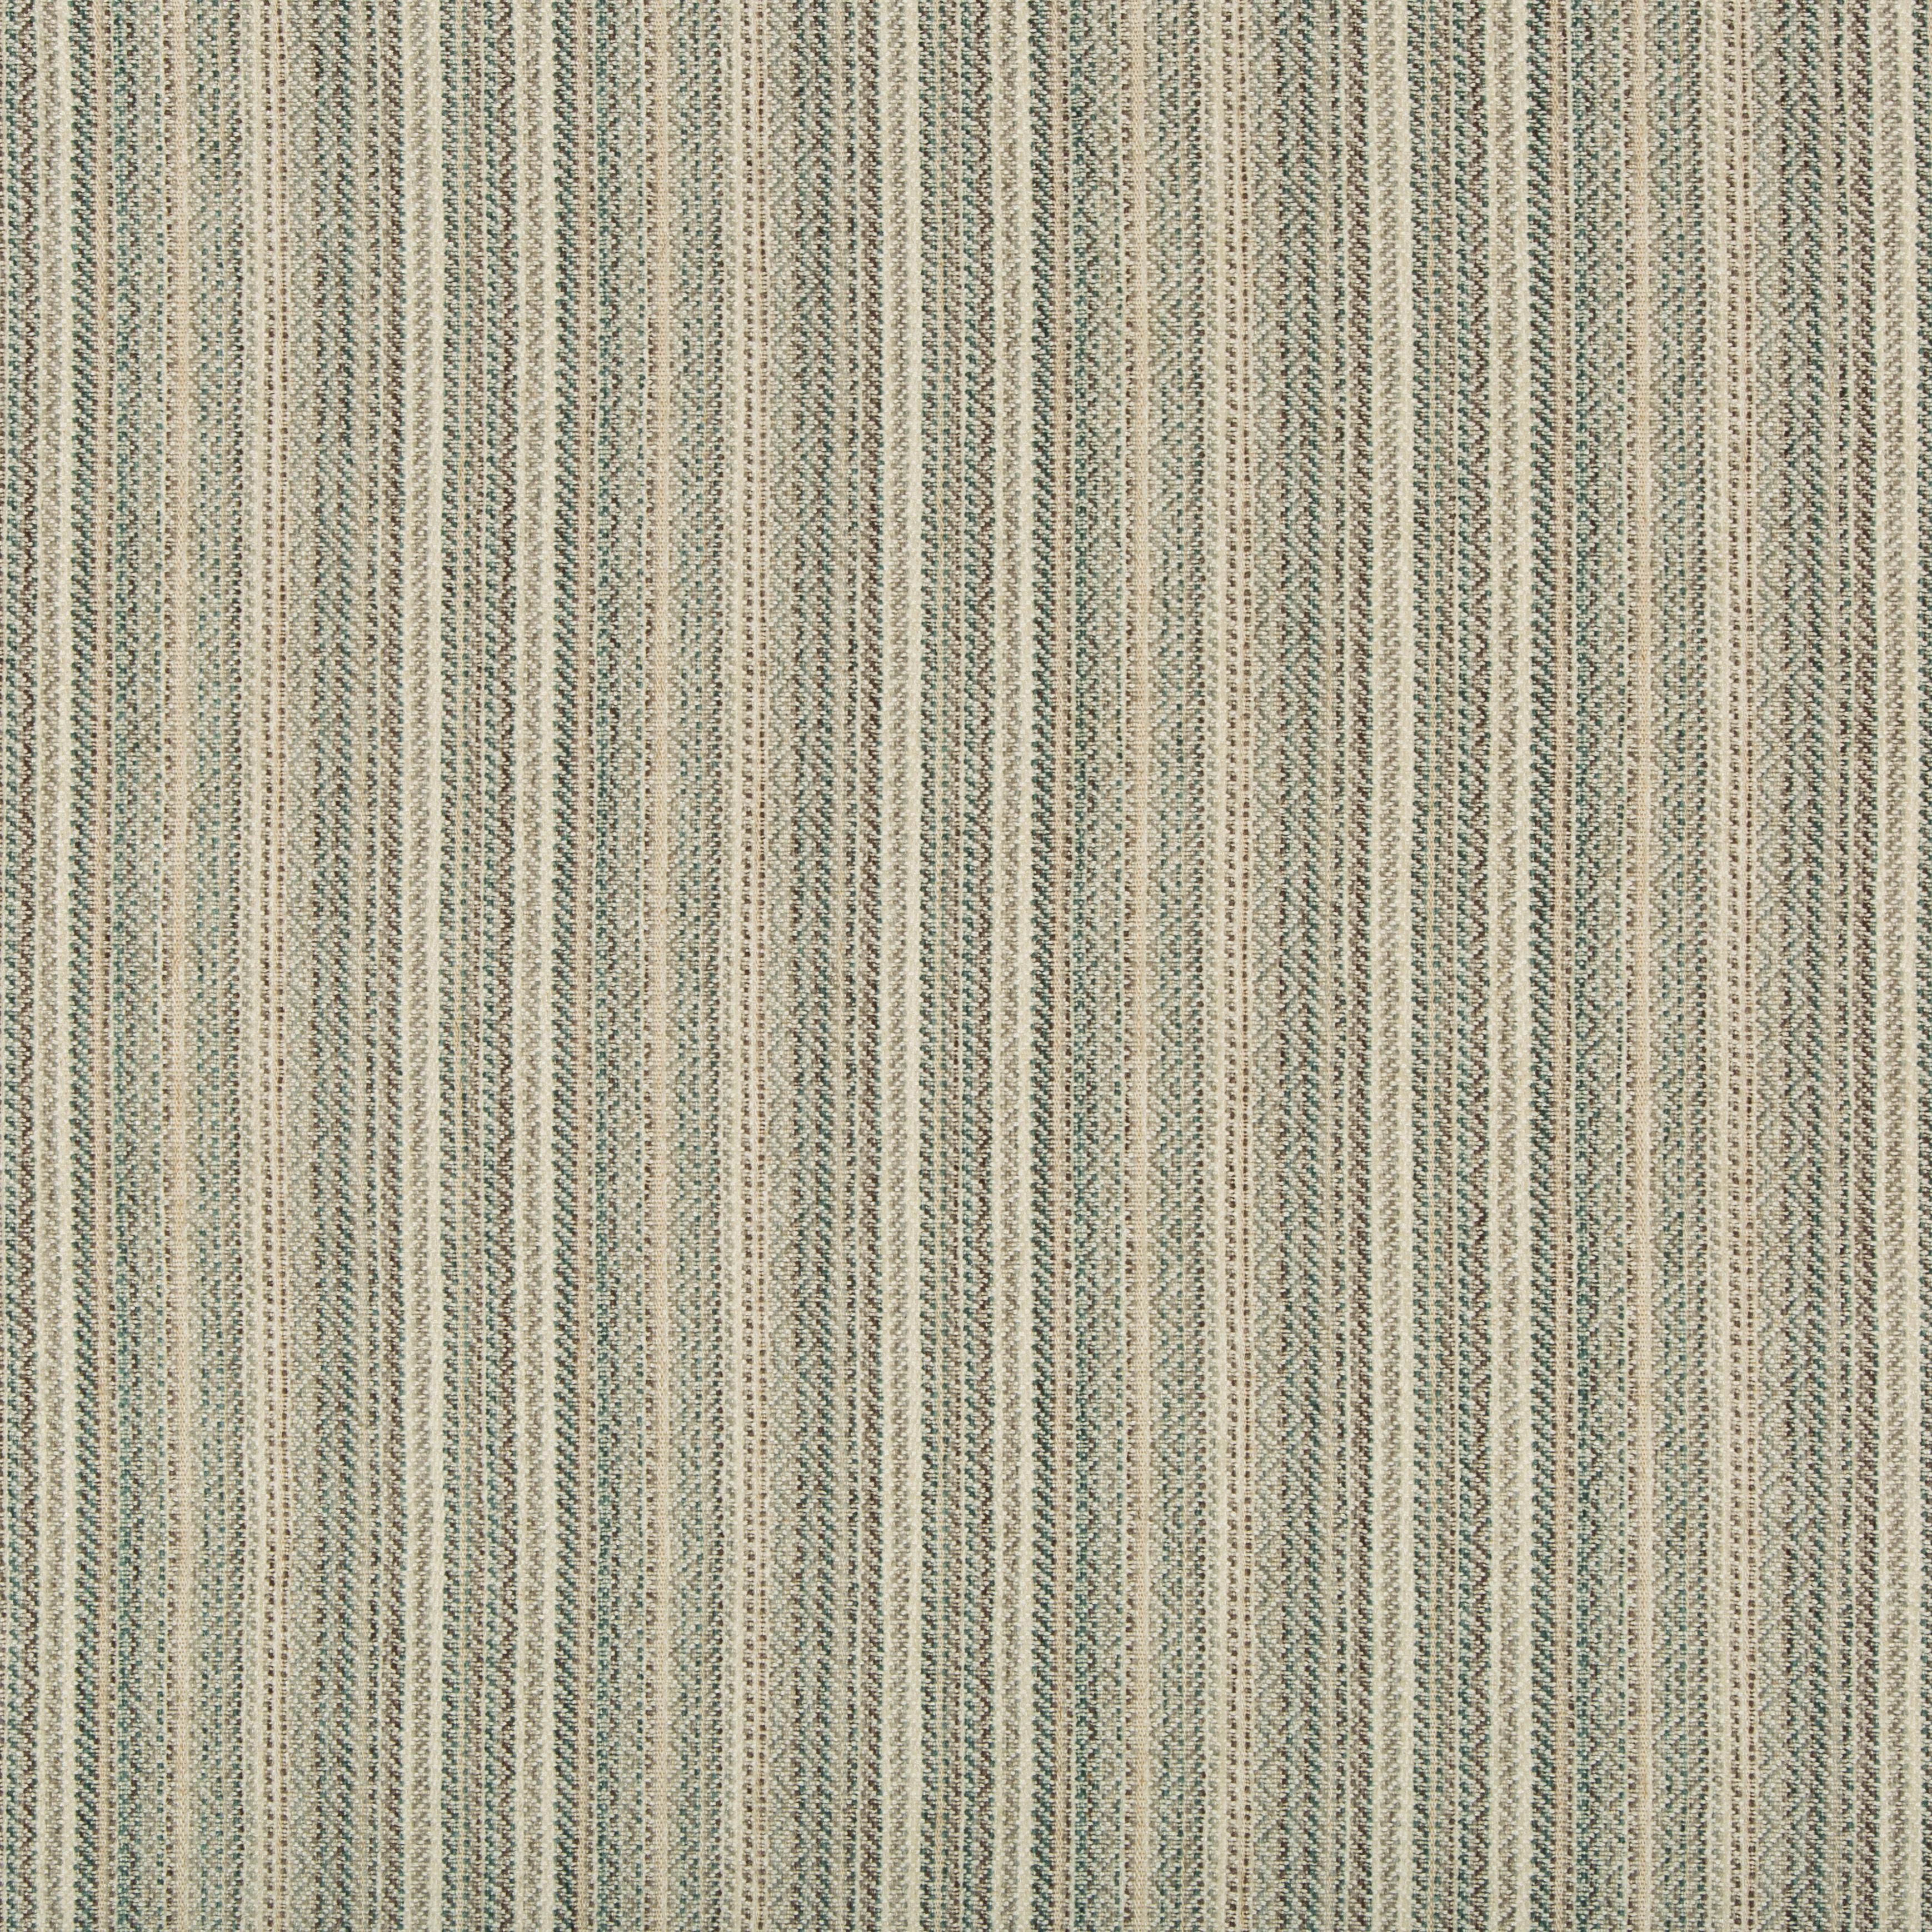 Bryan Seascape (QS Reserve Fabric) 1